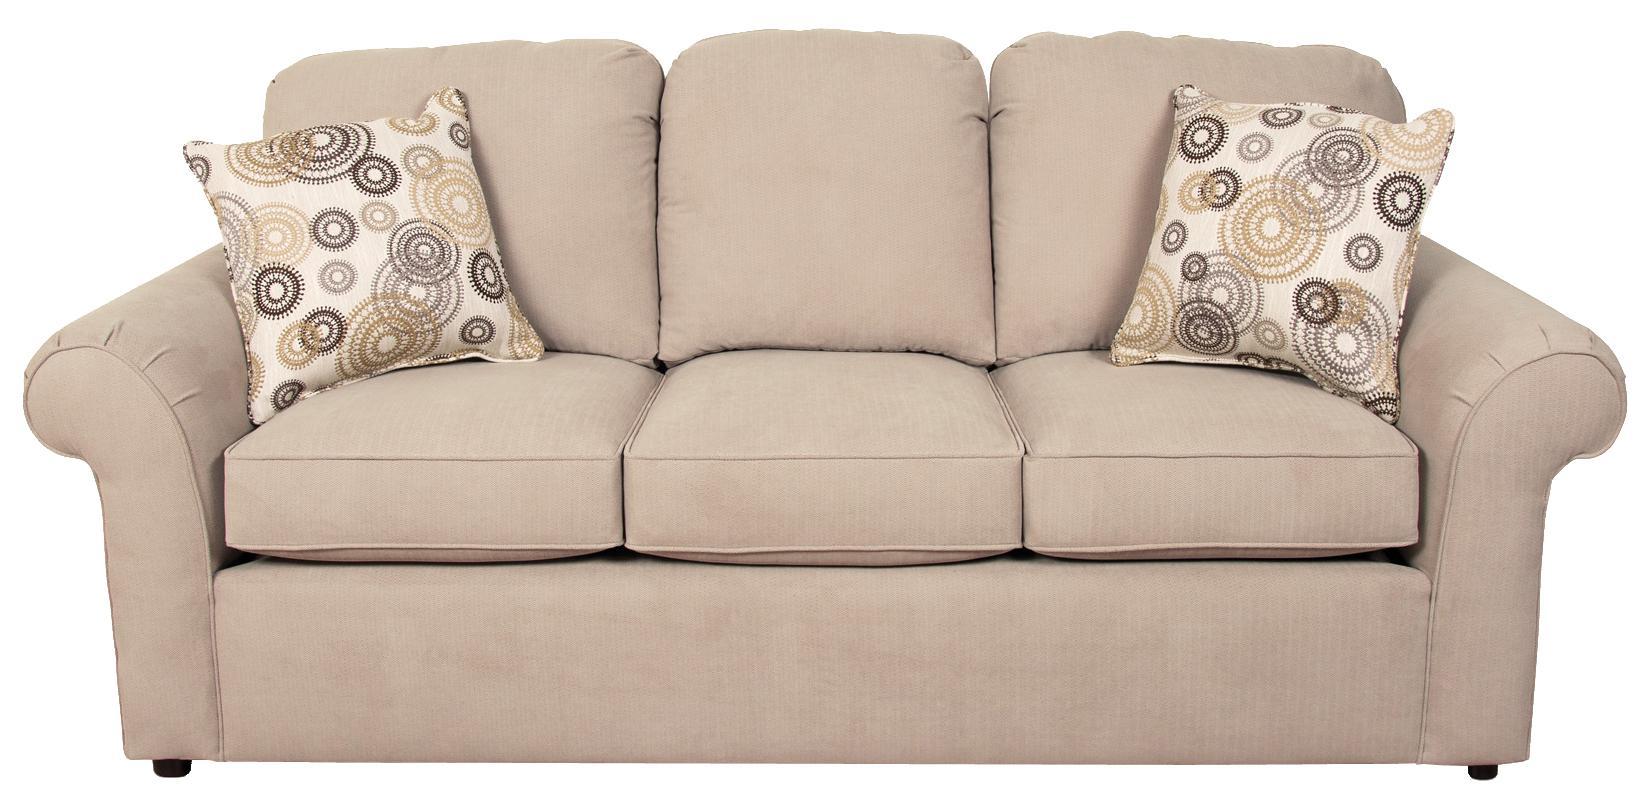 England Malibu Sofa - Item Number: 2405